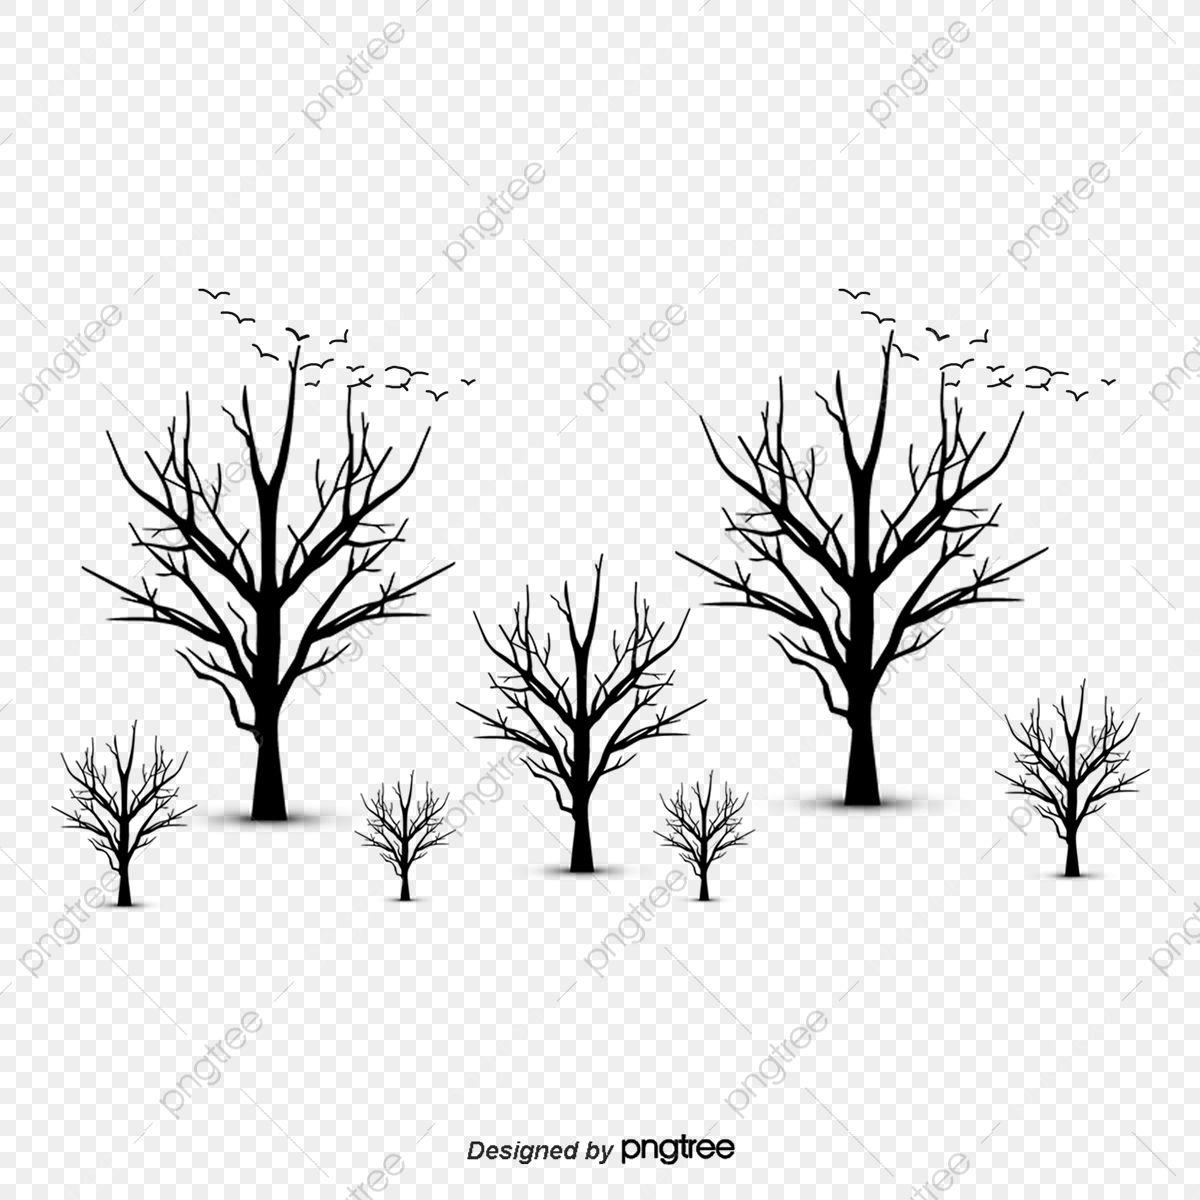 30+ Autumn Tree Clipart Black And White